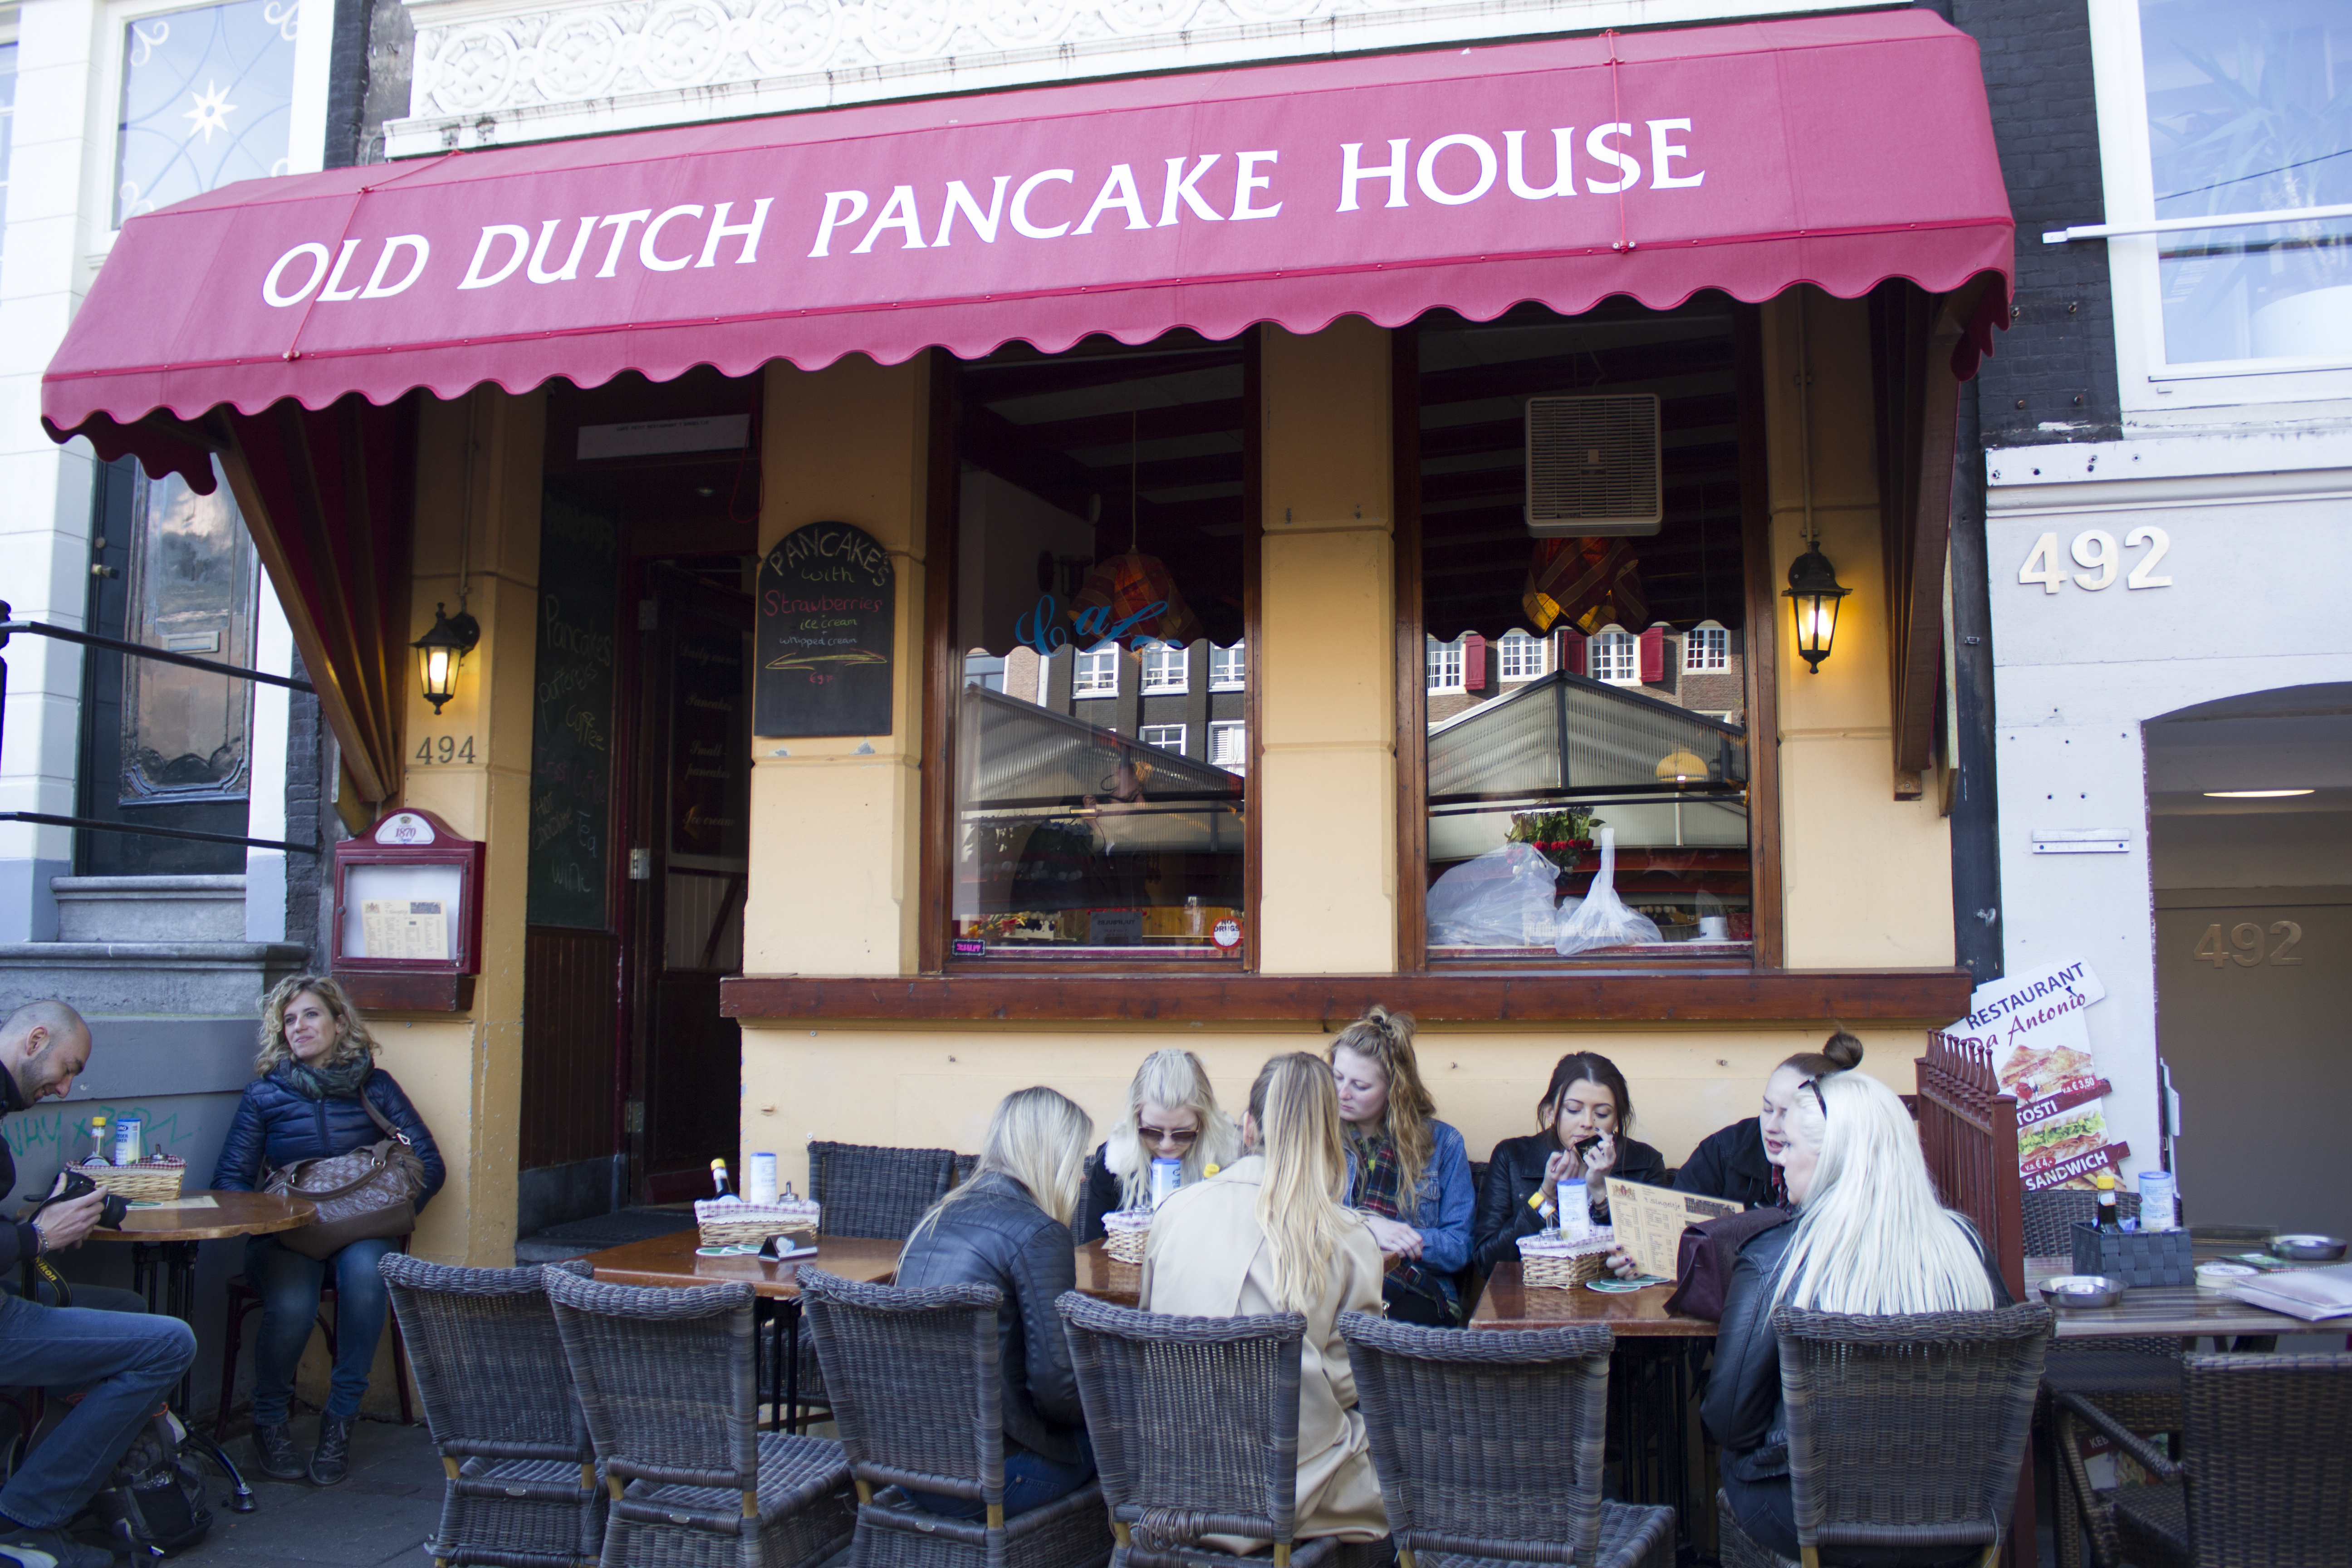 The best pancakes!